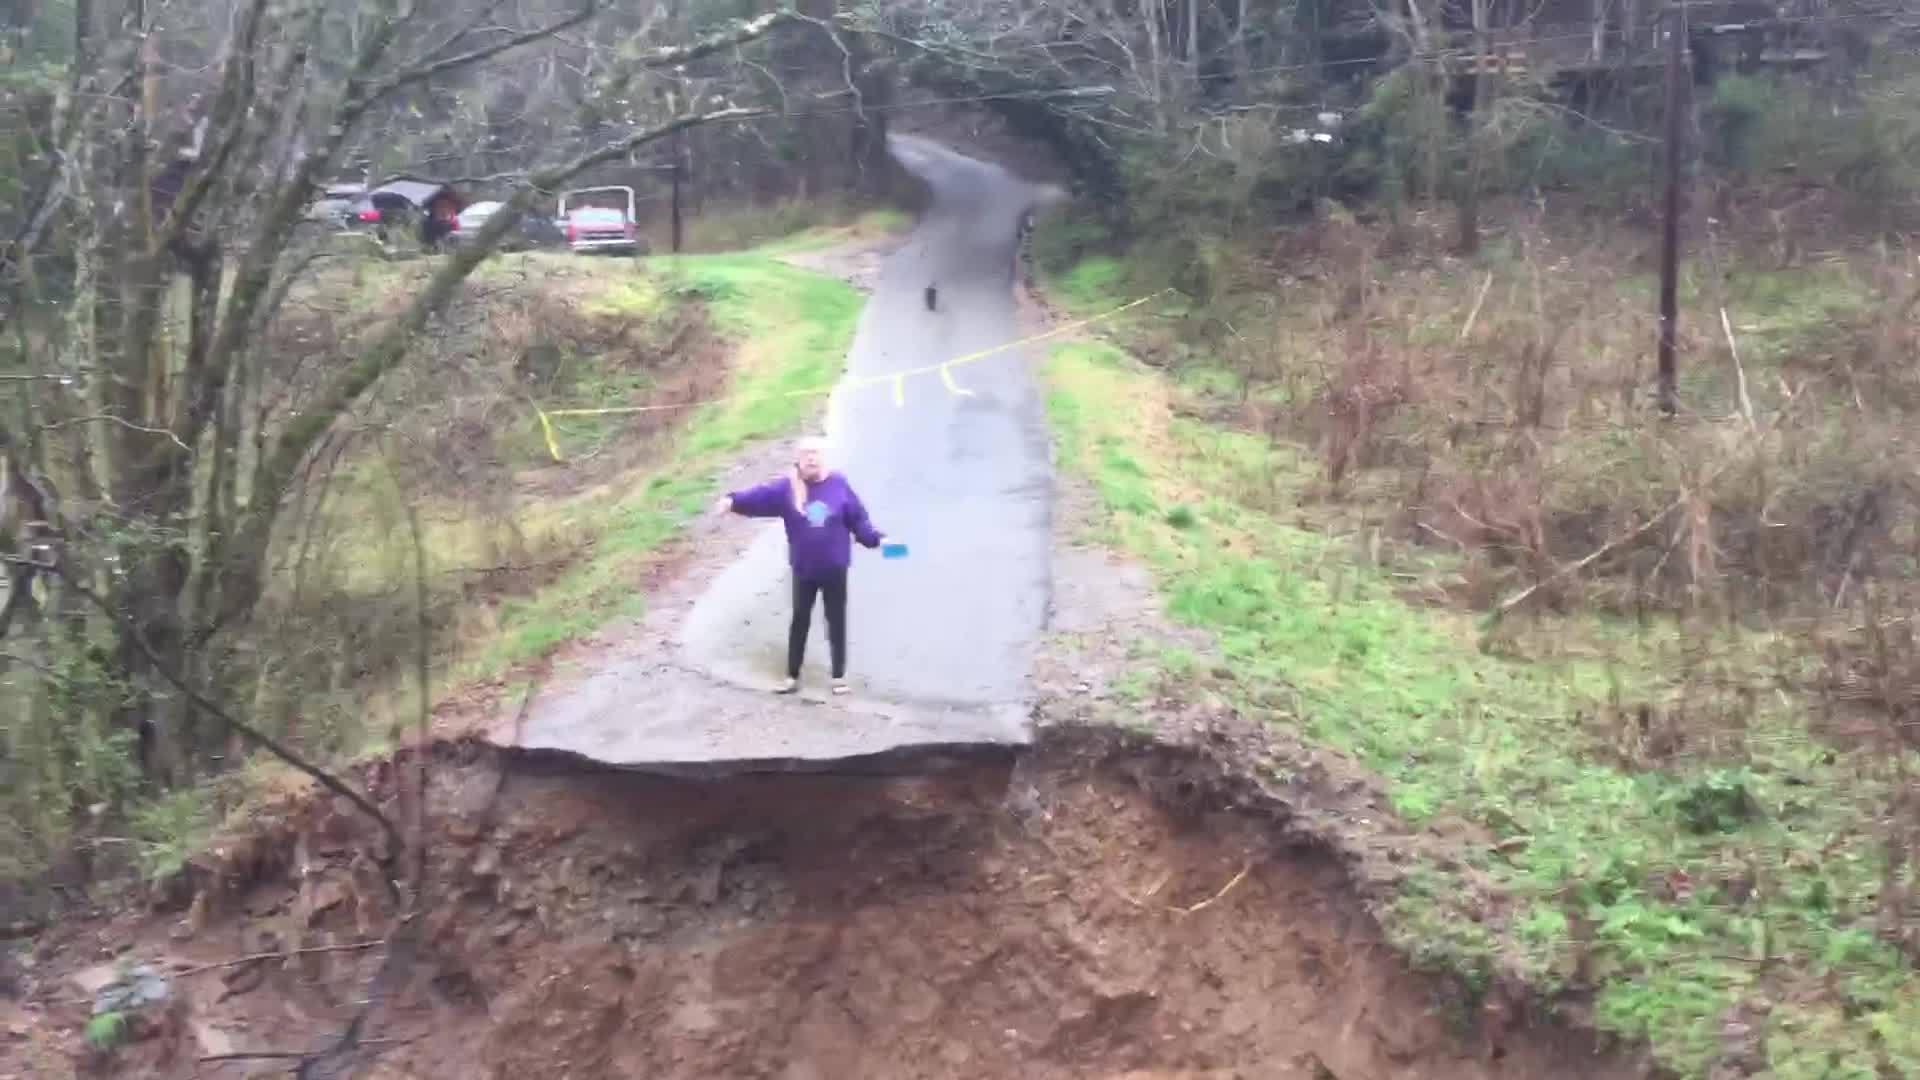 People_Stranded_After_Flooding_7_20190223184509-118809318